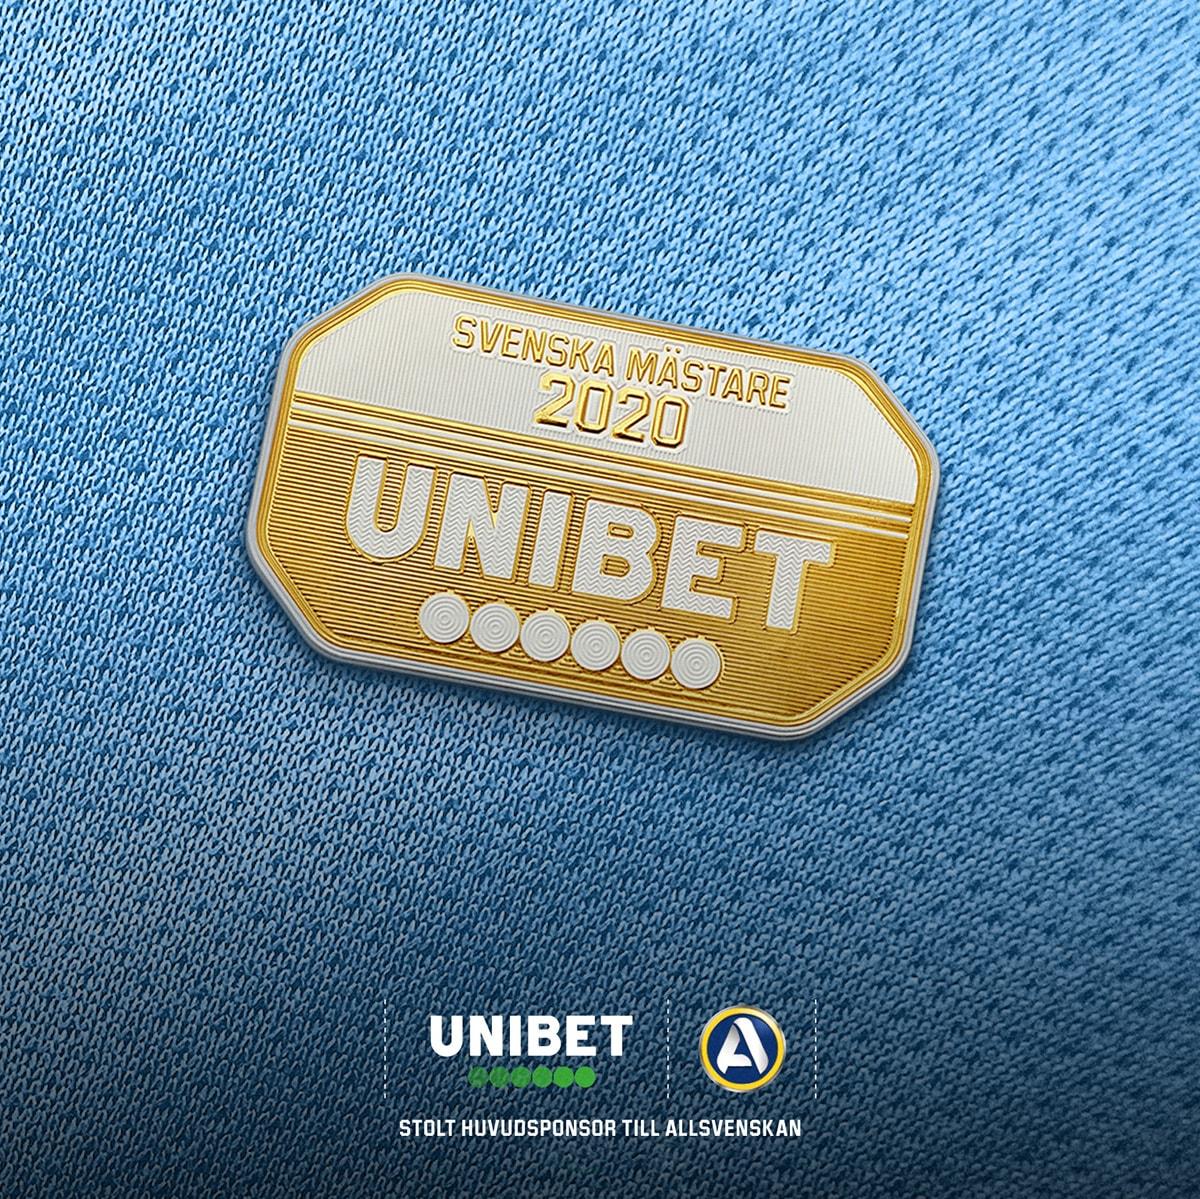 Allsvenskan+Unibet-patch guld